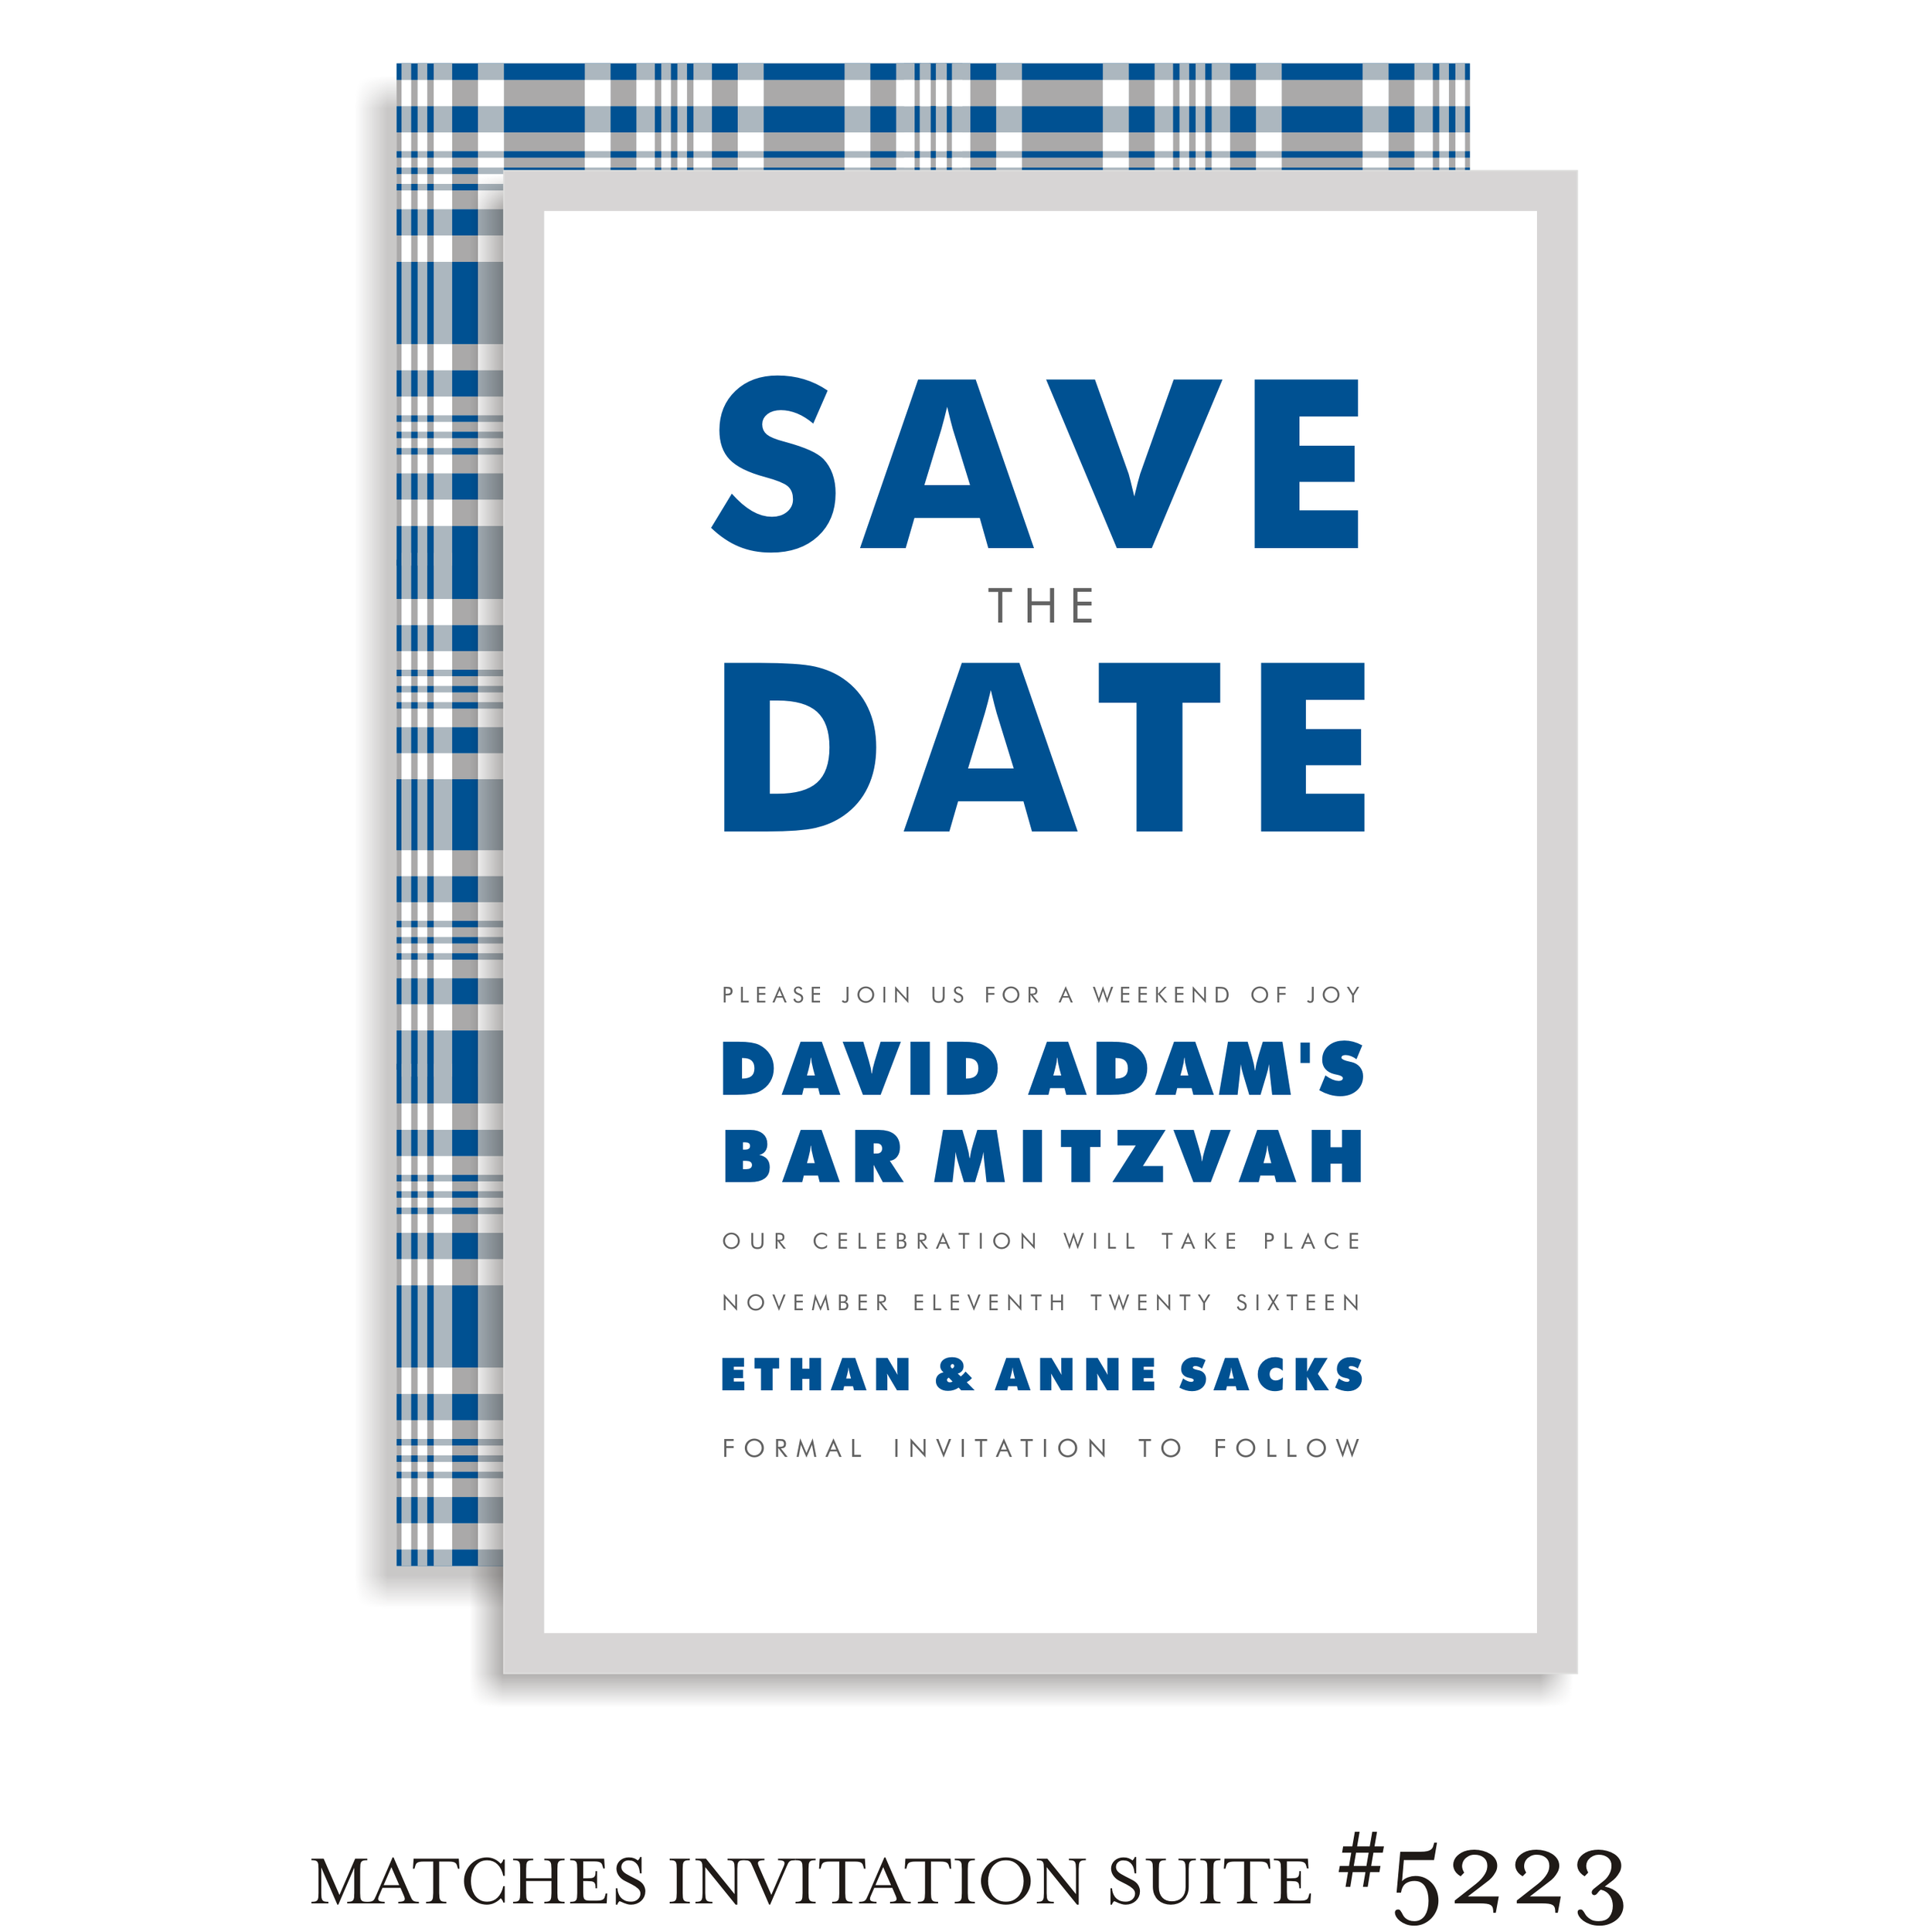 Save the Date Bar Mitzvah Suite 5223 - David Adam